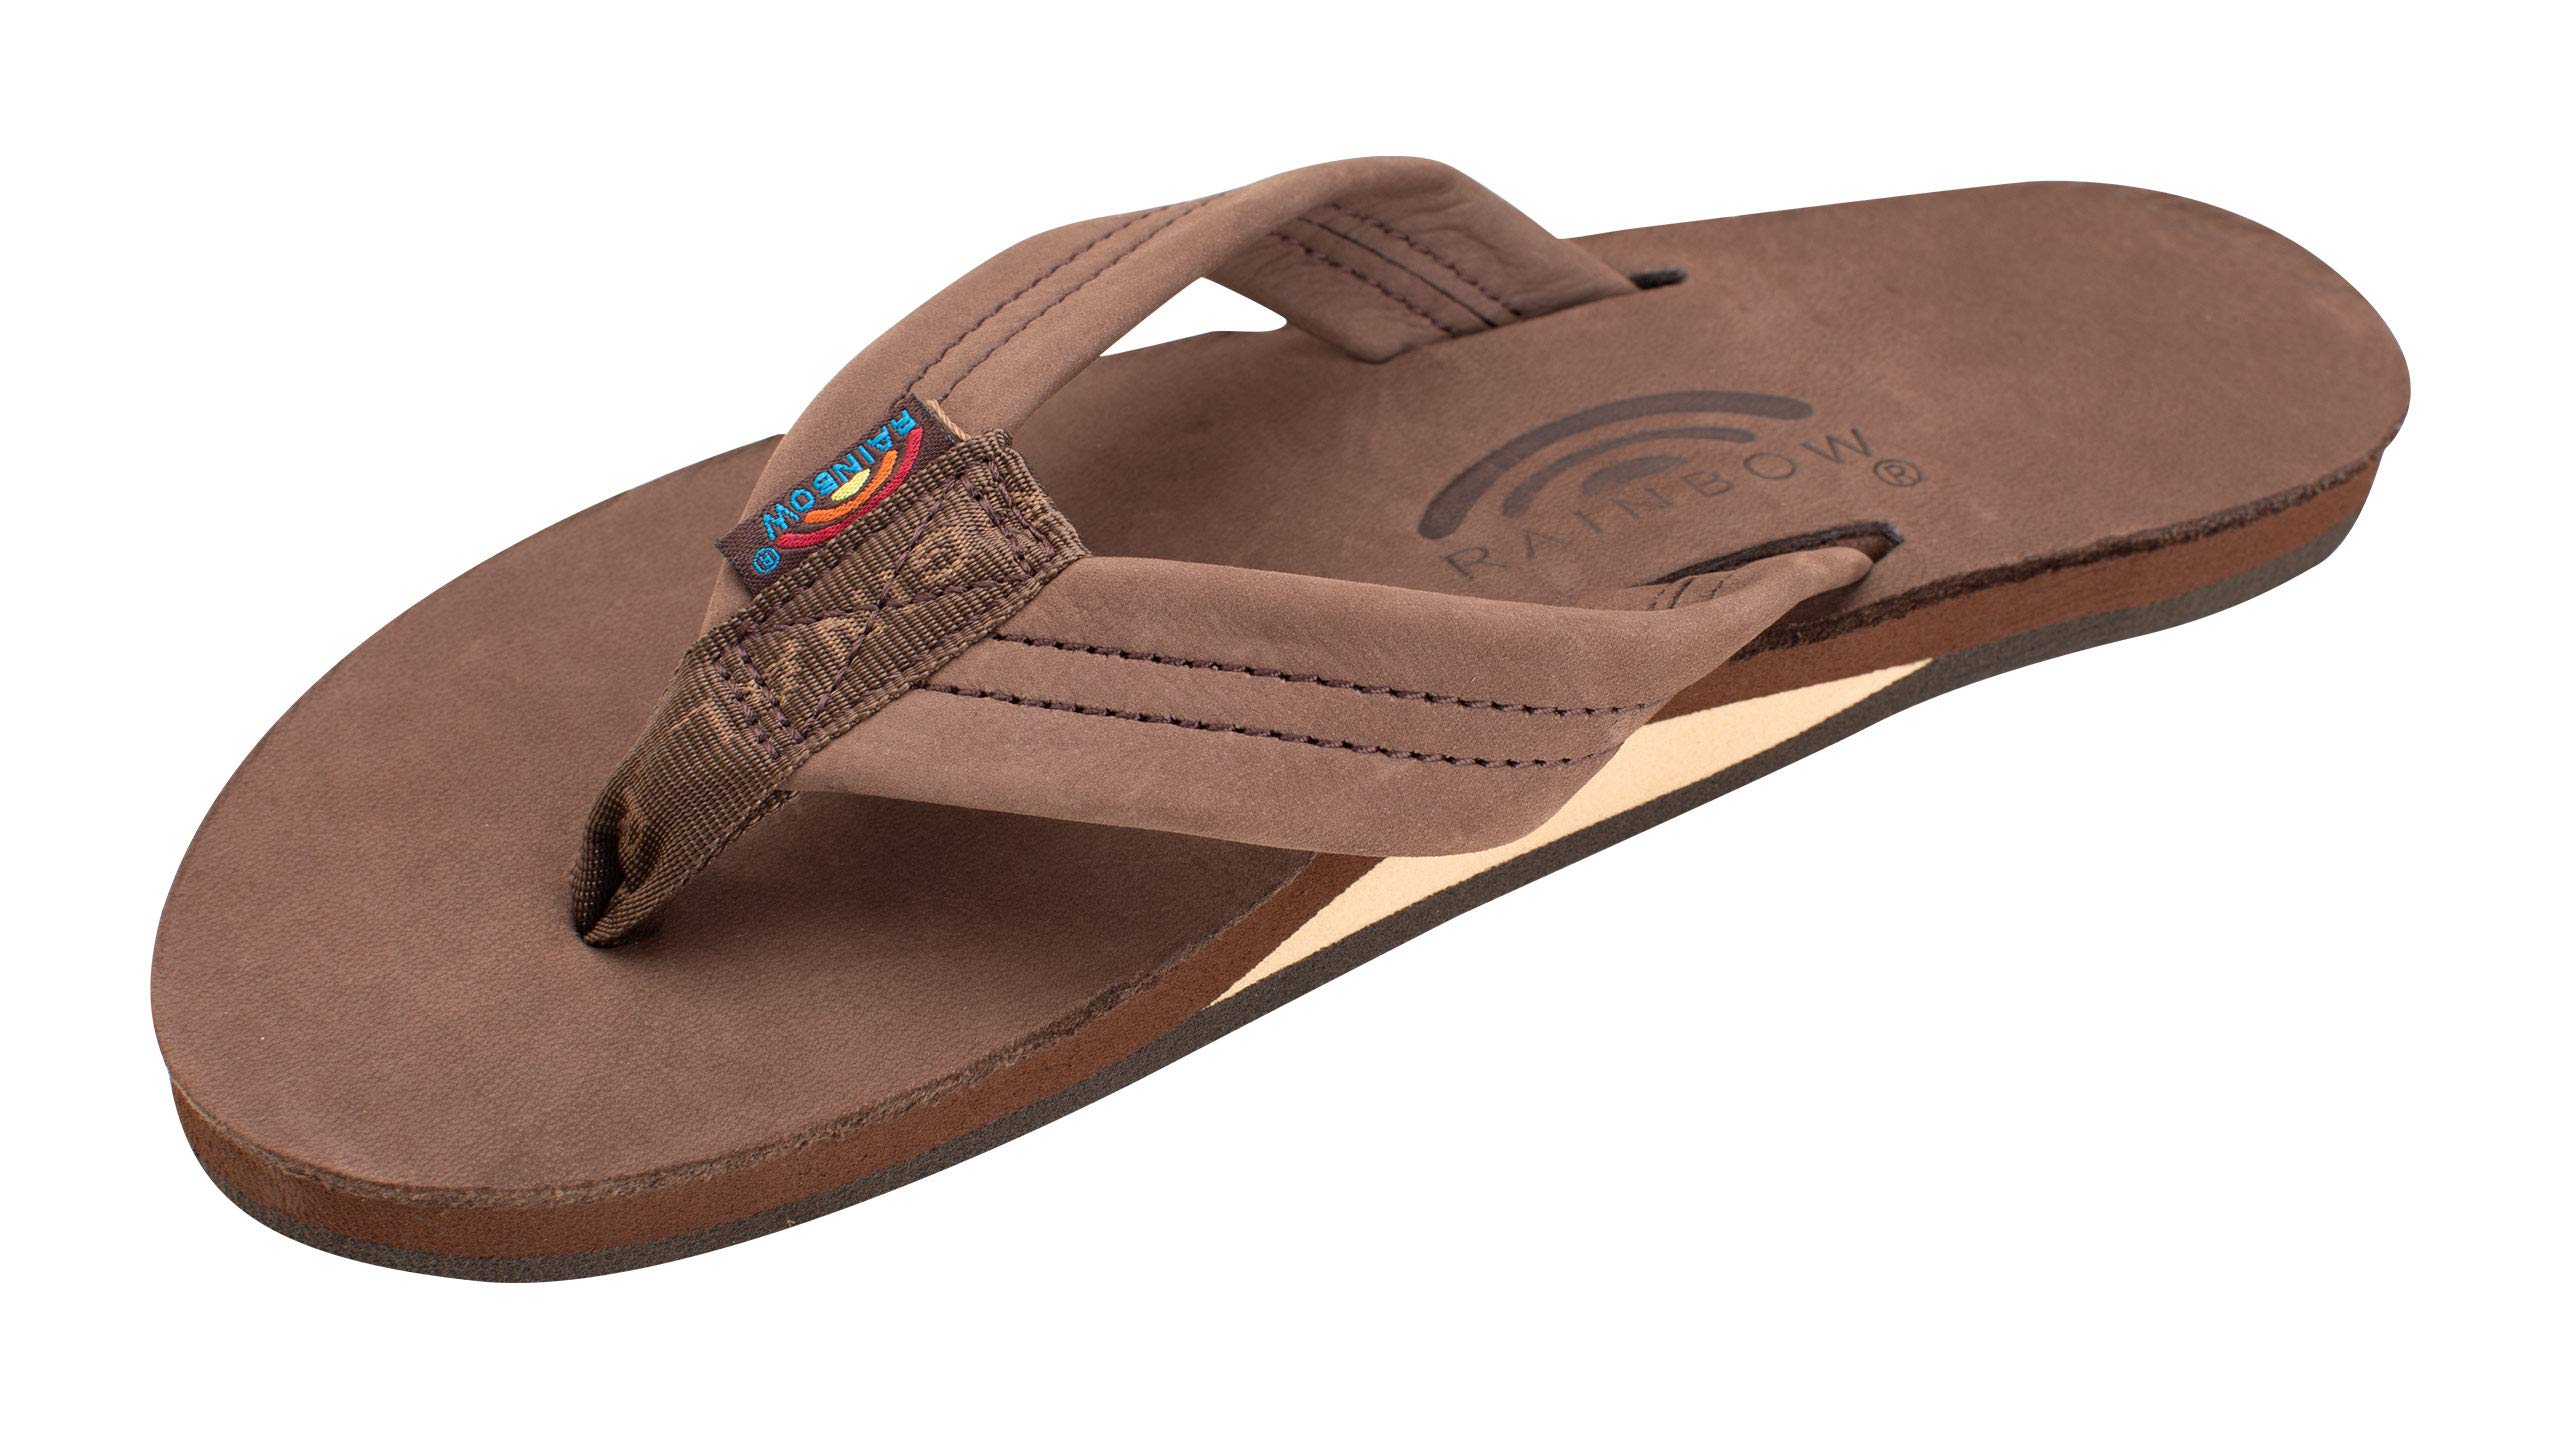 Rainbow Sandals Women's Single Layer Premier Leather Sandal, Expresso, Ladies Large / 7.5-8.5 B(M) US by Rainbow Sandals